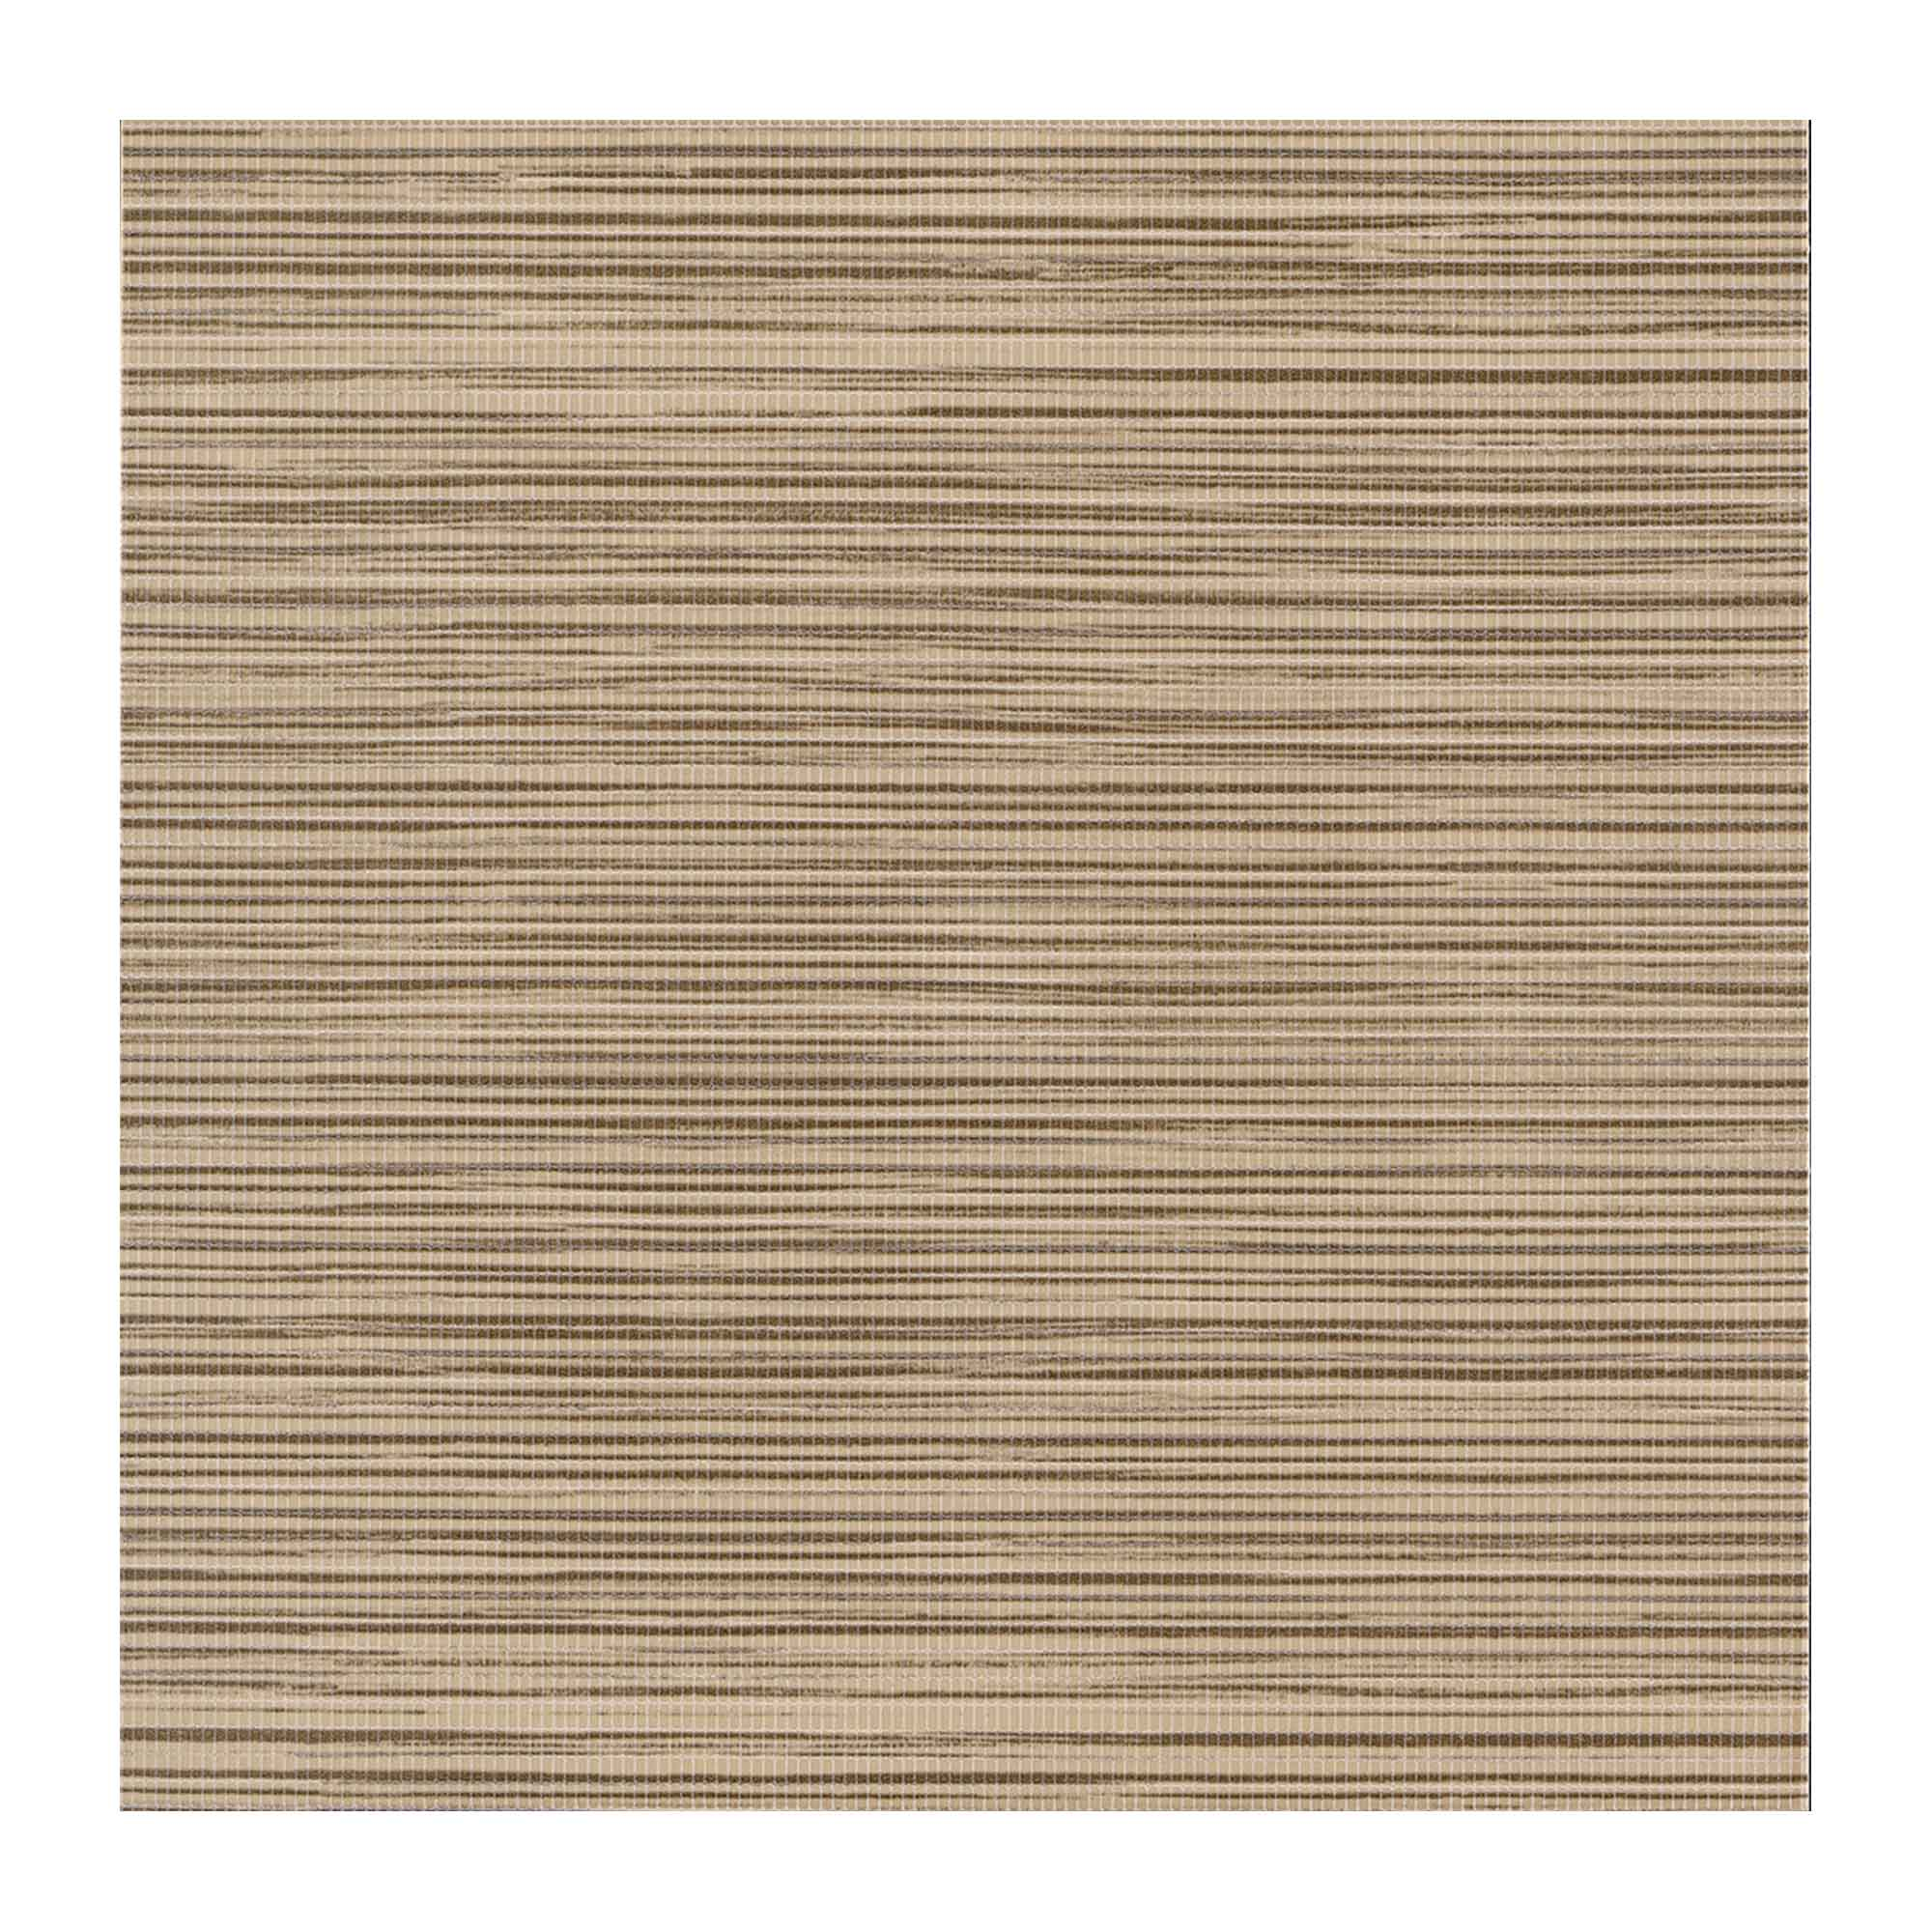 Gresie portelanata pentru interior, Canvas ocru, 33 x 33 cm imagine 2021 mathaus